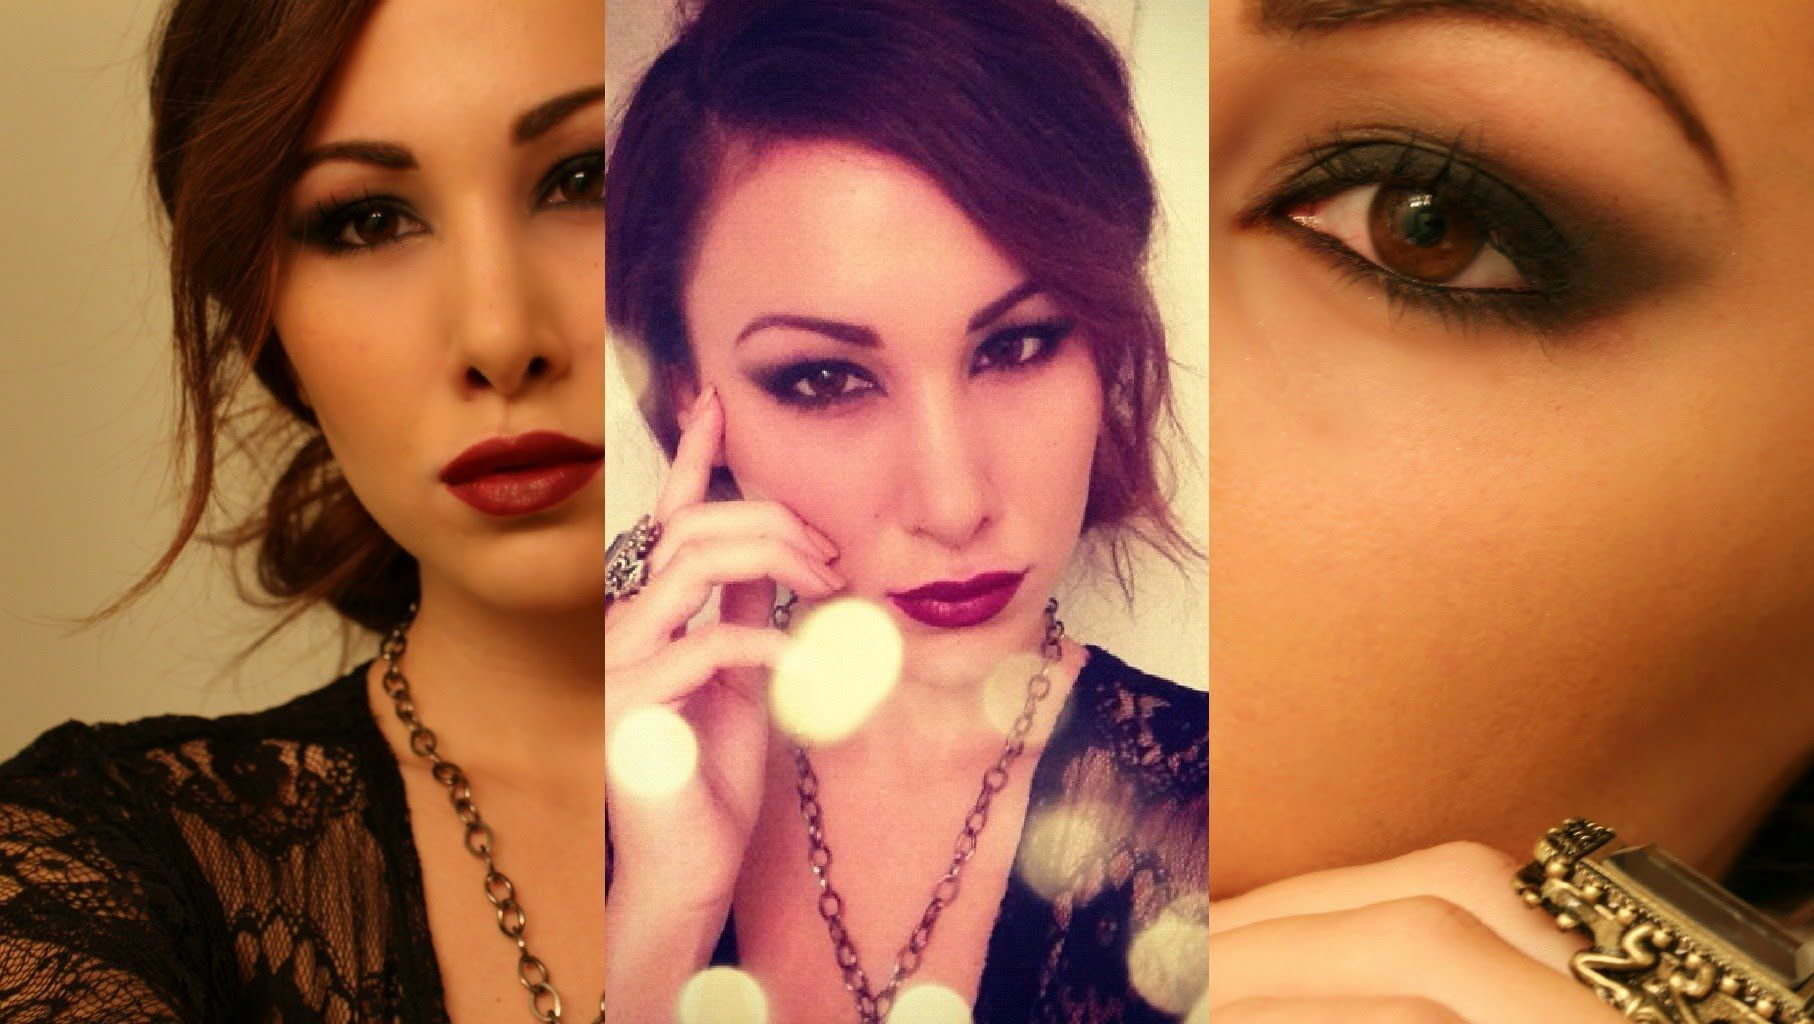 Skyfall bond girl inspired makeup tutorial my face pinterest skyfall bond girl inspired makeup tutorial baditri Image collections